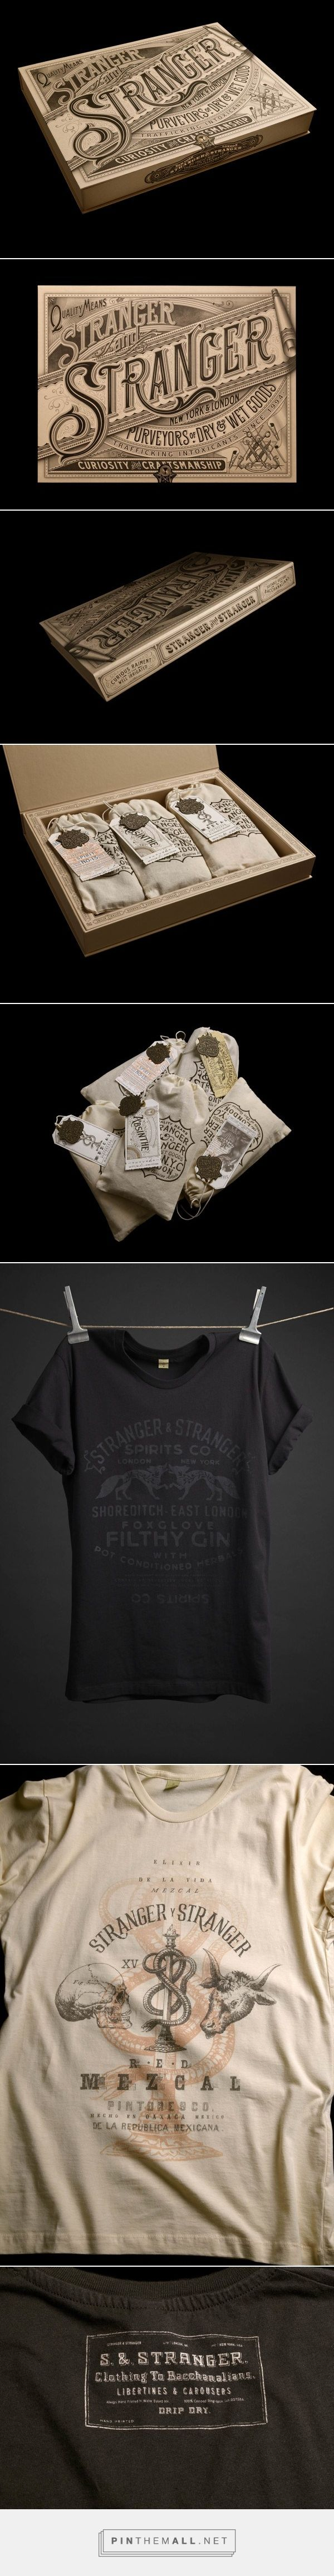 T shirt design app for ipad - Vintage T Shirt Packaging Design By Stranger Stranger